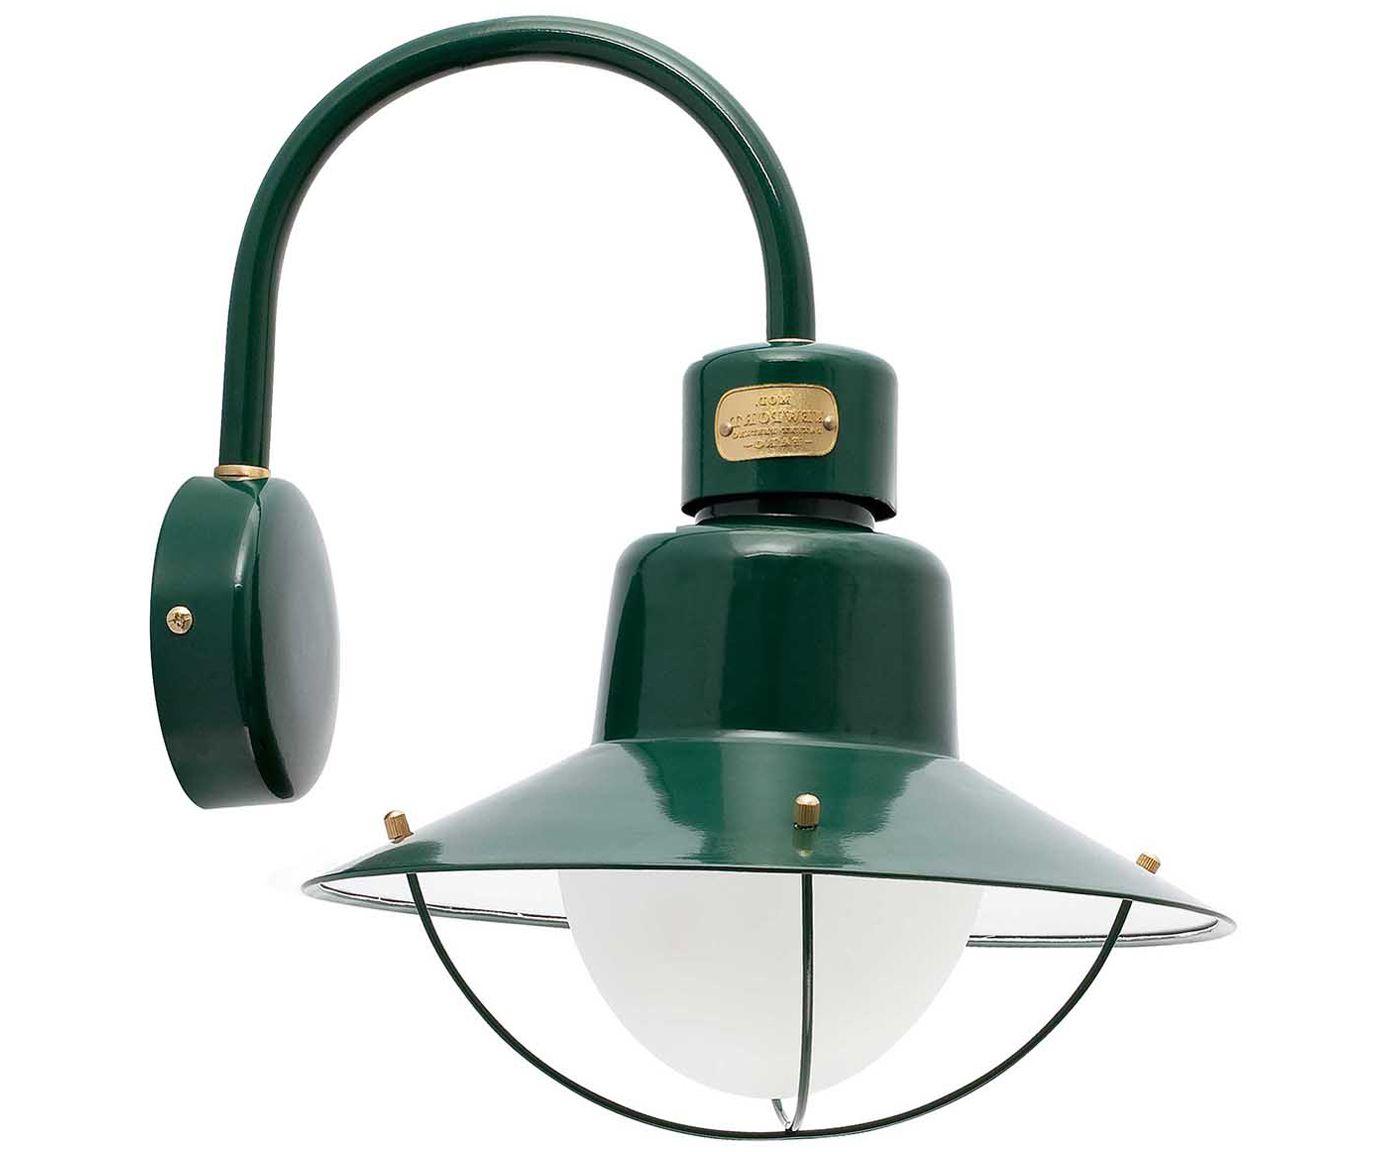 82 Aussenwandleuchte Newportfaro Barcelona Mehr Aussenleuchten 3 Preis 82 Inkl Mwst Grune Lampe Aussenwandleuchte Gruner Lampenschirm